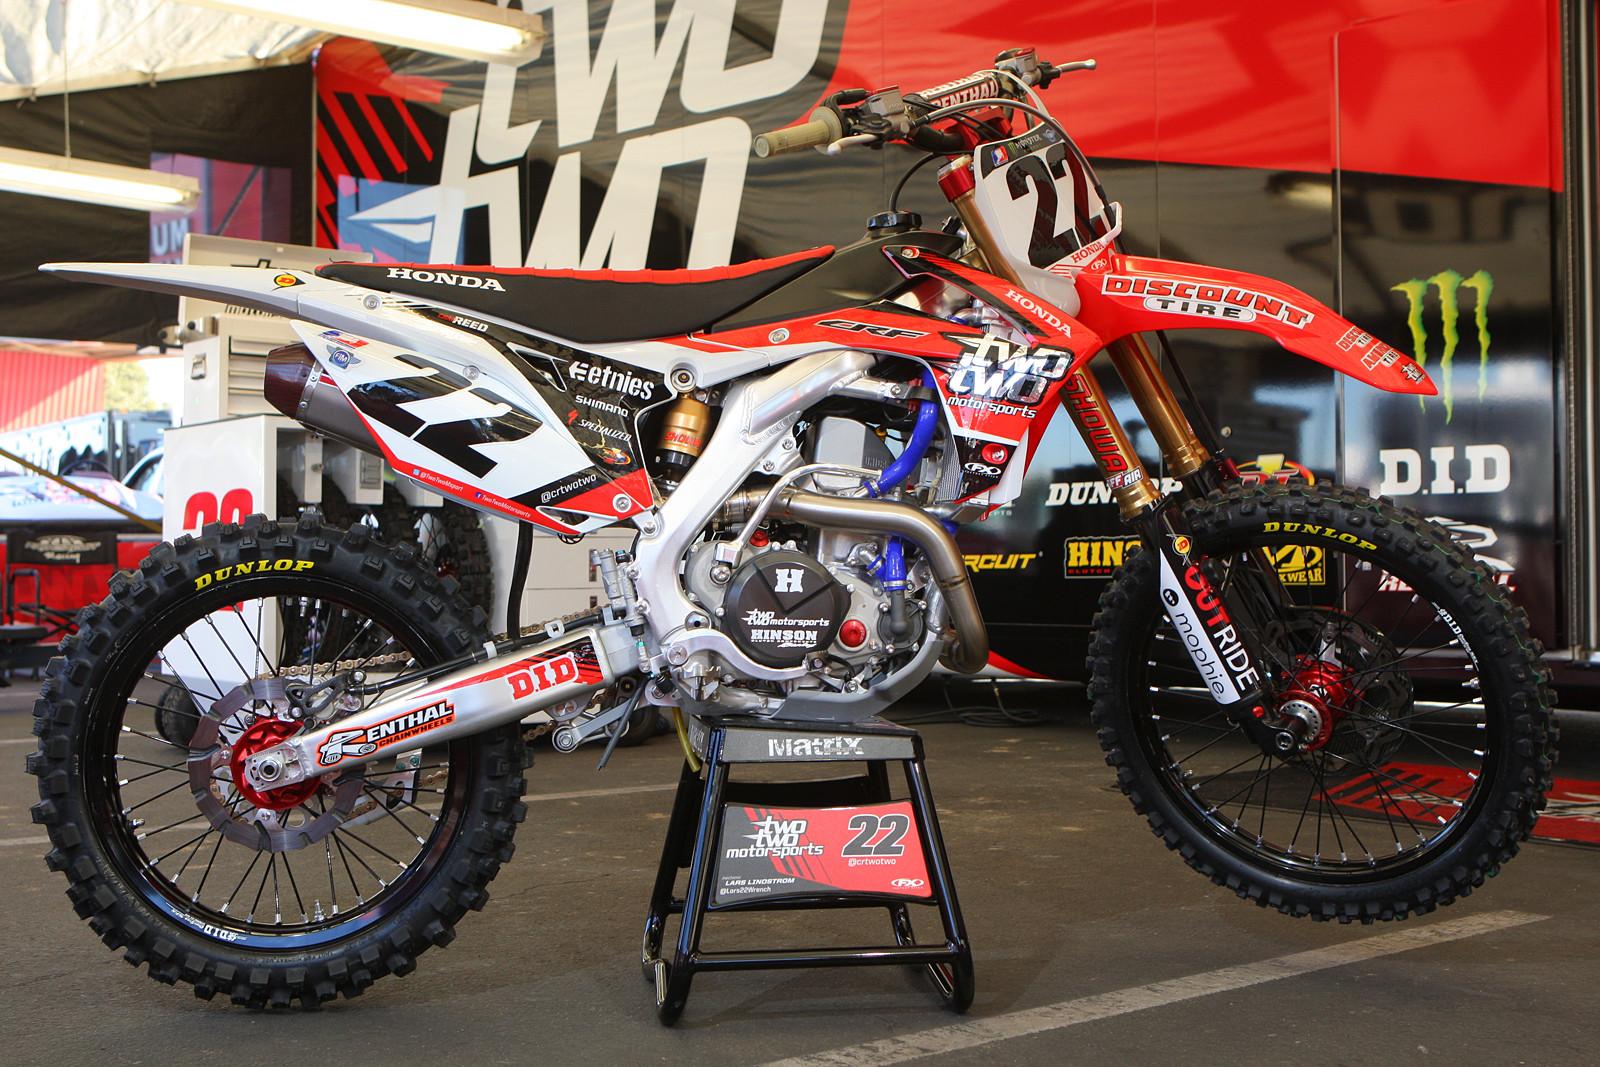 Best Looking Team Bike Since 1983 Moto Related Motocross Forums Honda Bikes Message Boards Vital Mx